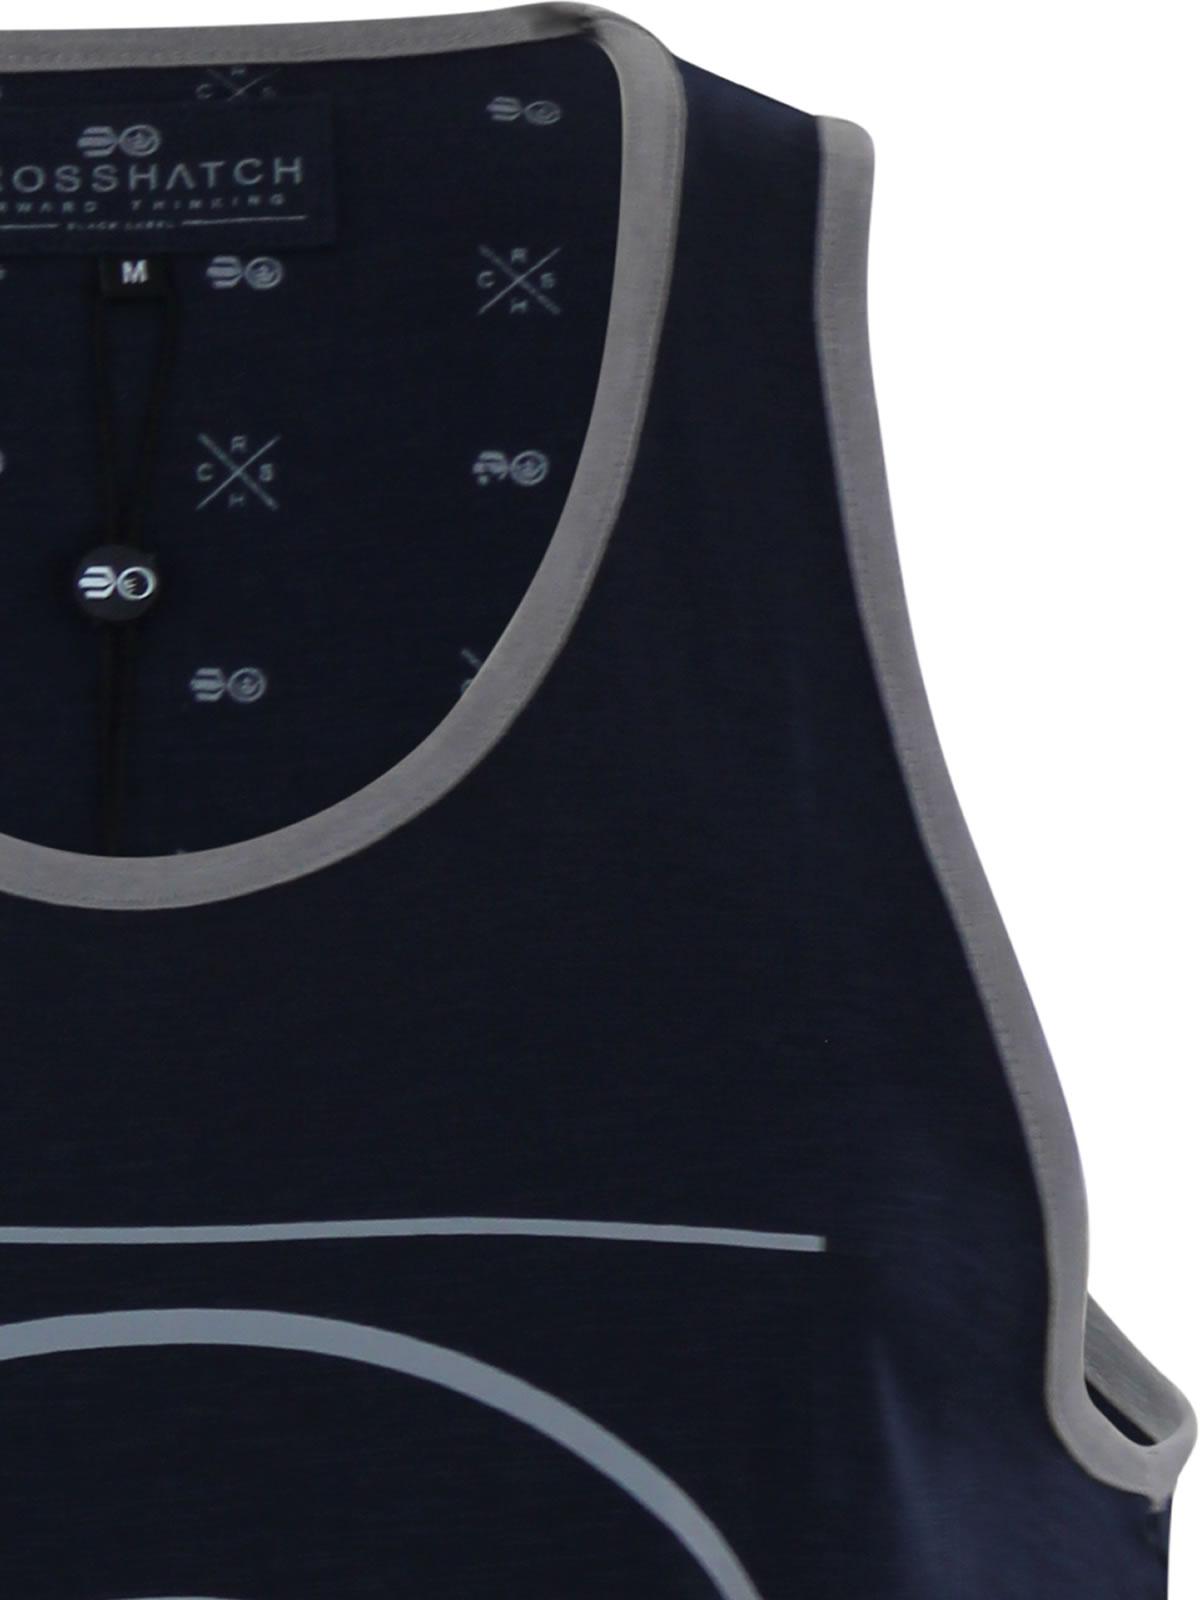 miniature 10 - Homme-debardeur-t-shirt-crosshatch-alfa-summer-muscle-back-tank-top